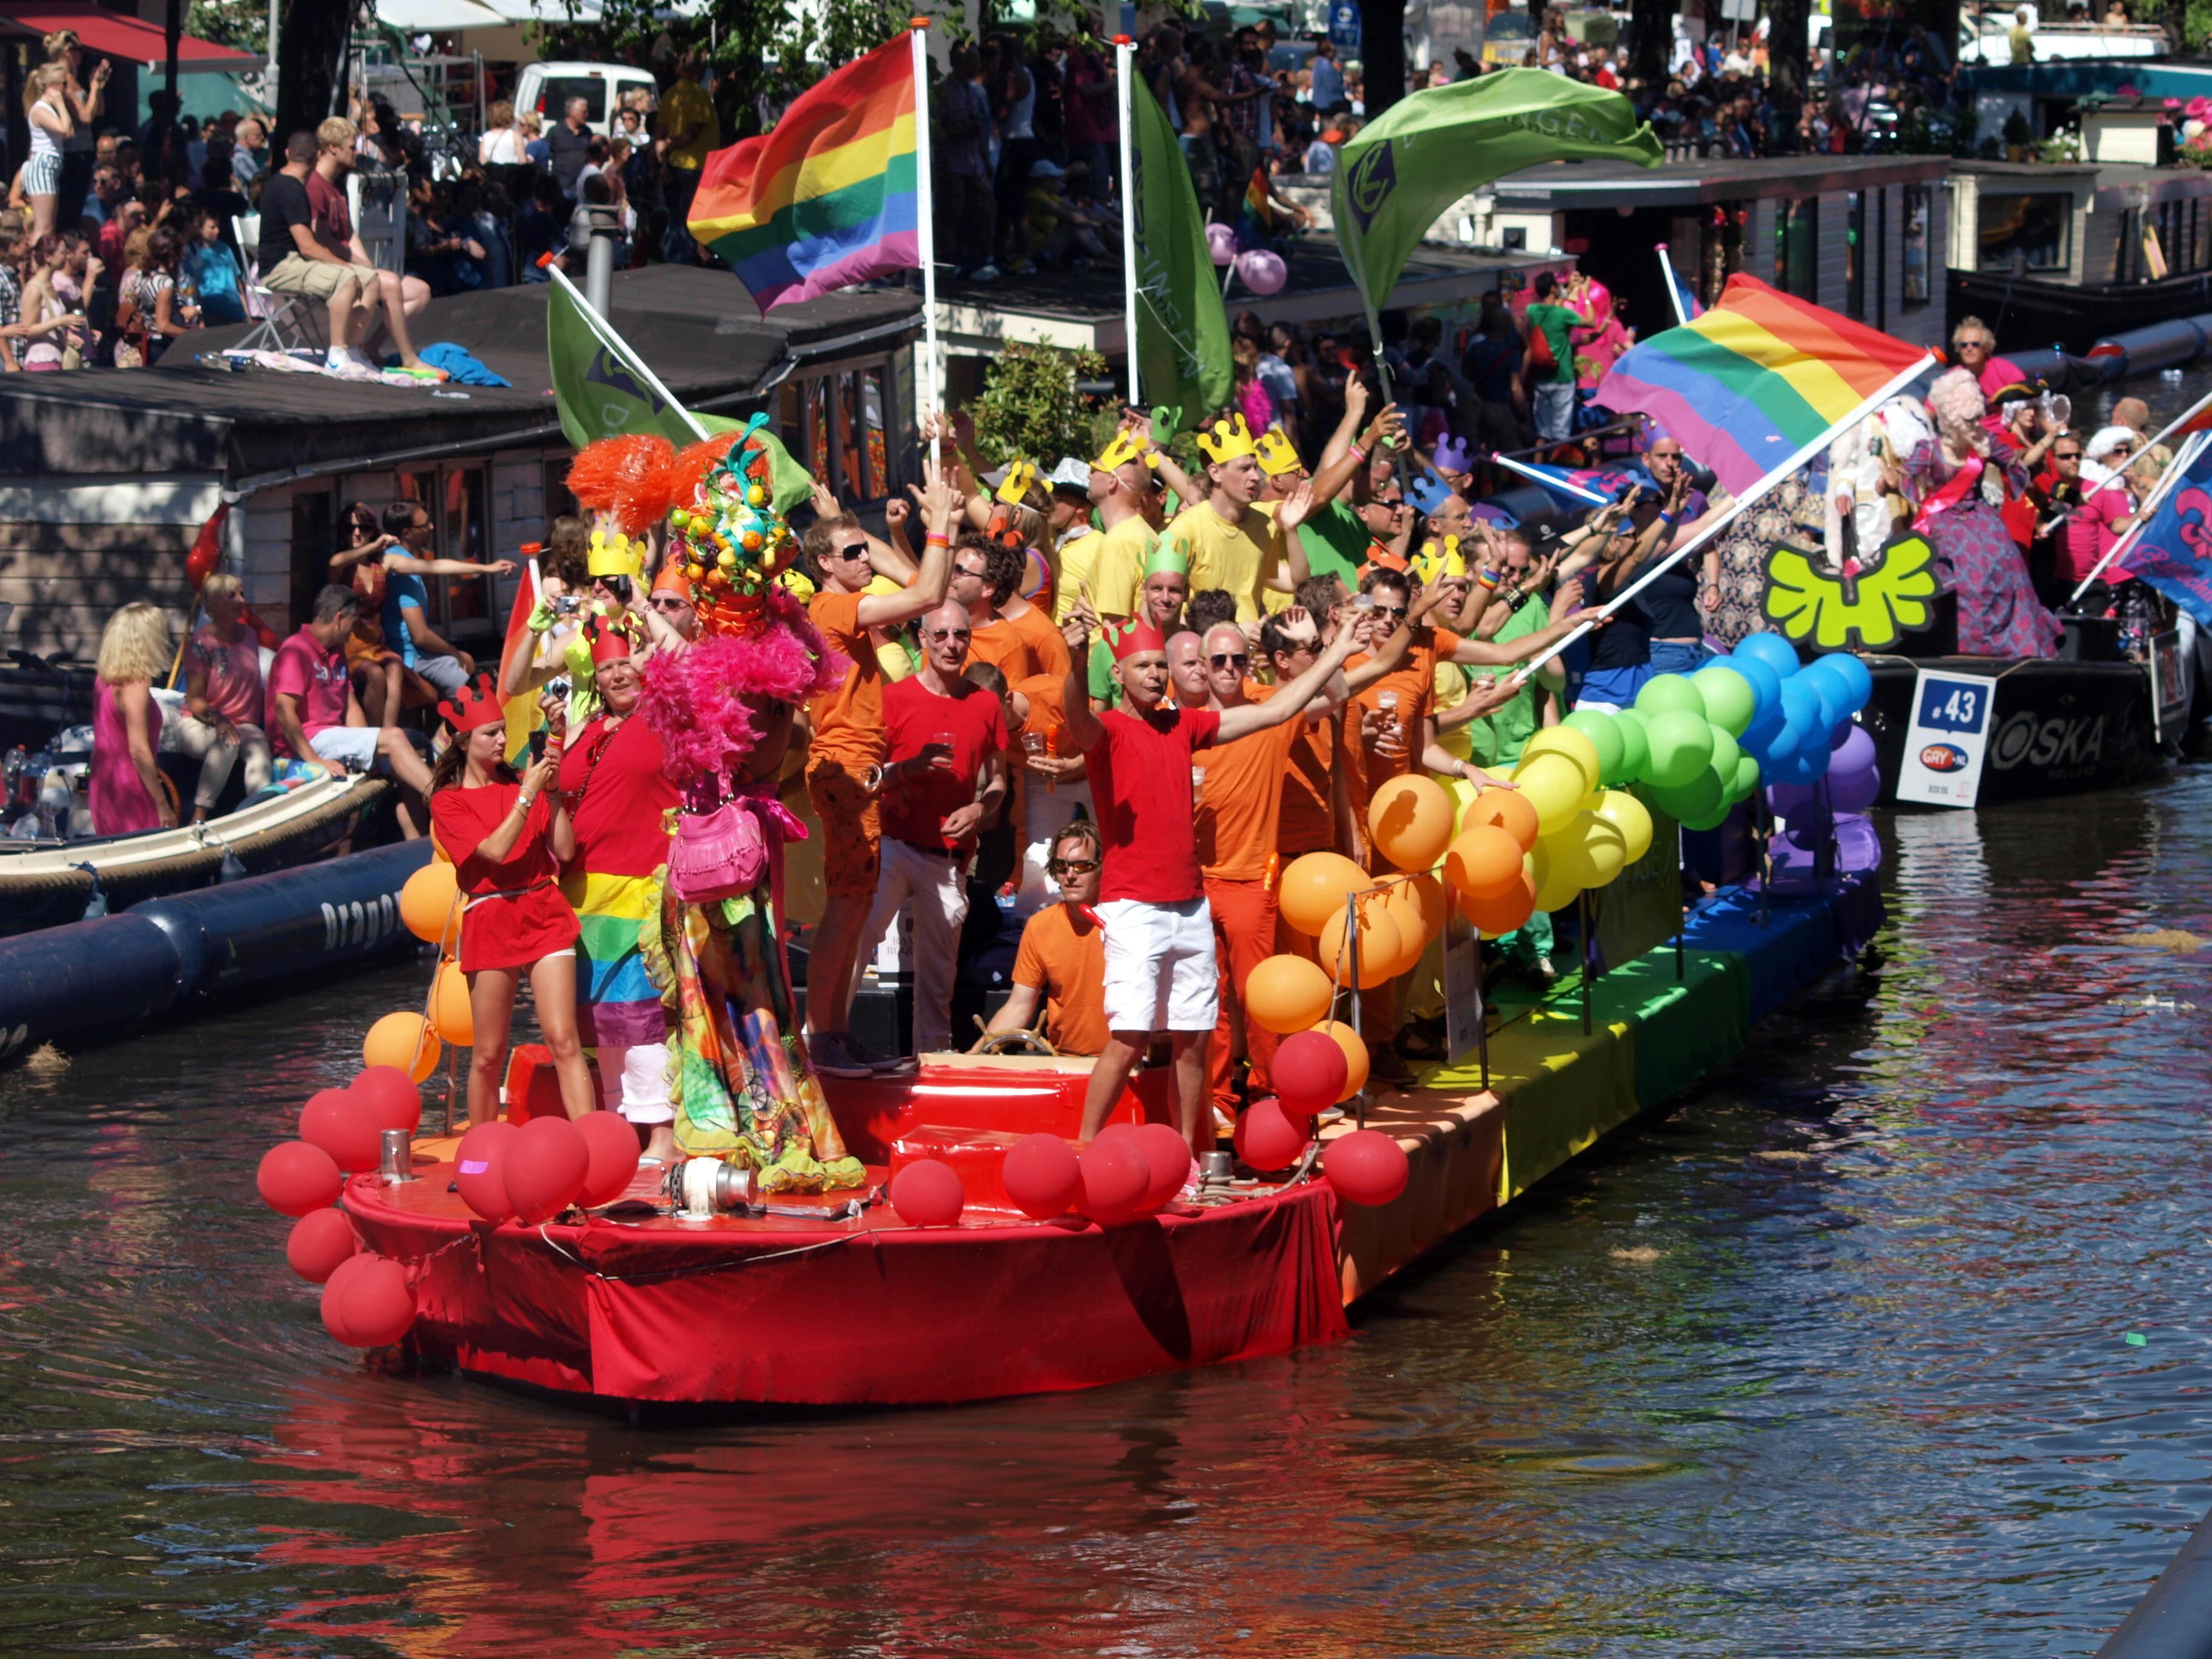 Gay speed dating amsterdam